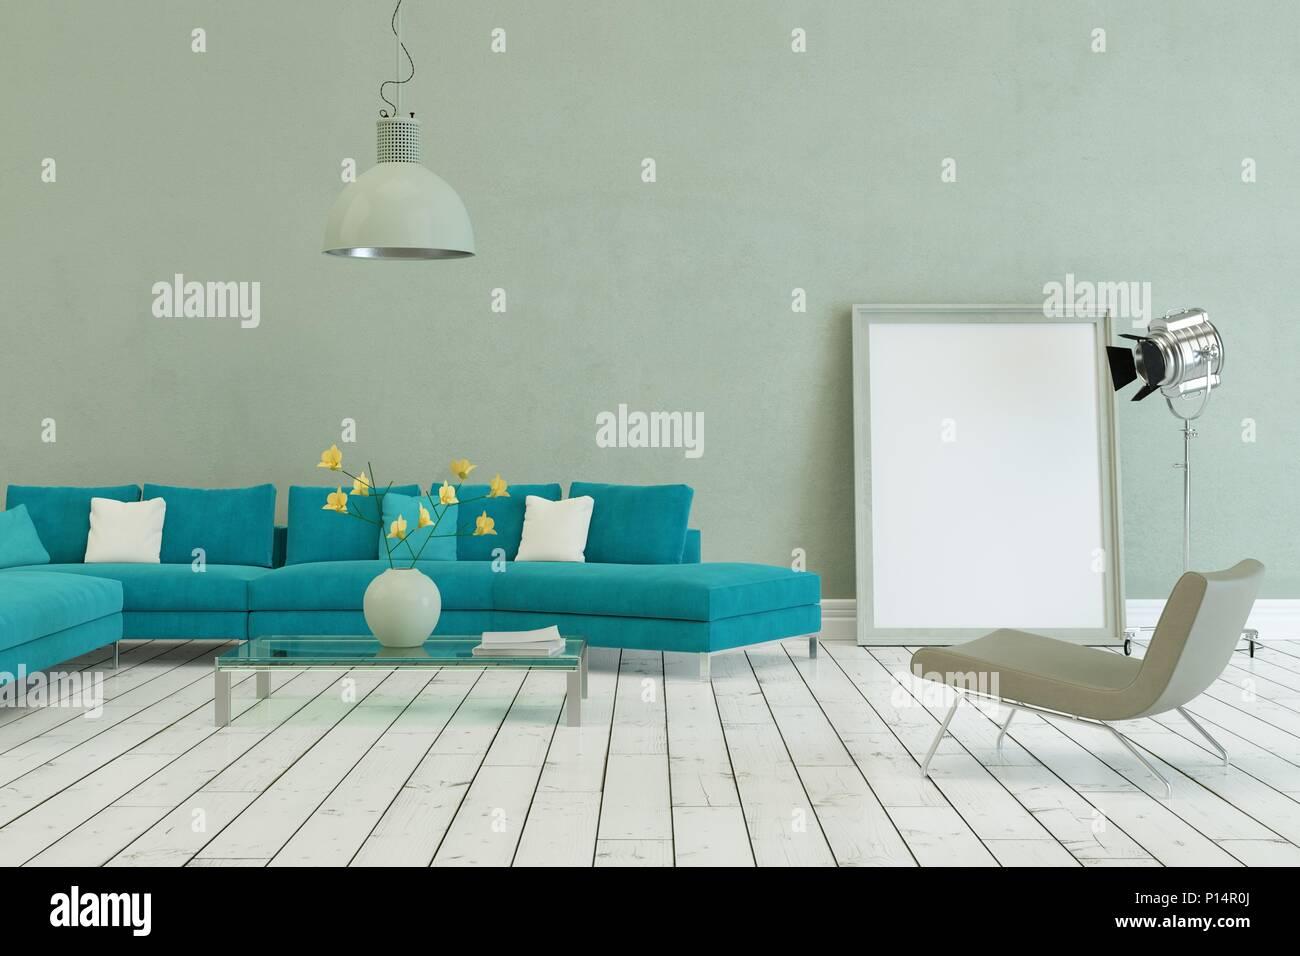 Awe Inspiring Blue Sofa In Modern Scandinavian Design With Grey Wall Stock Inzonedesignstudio Interior Chair Design Inzonedesignstudiocom